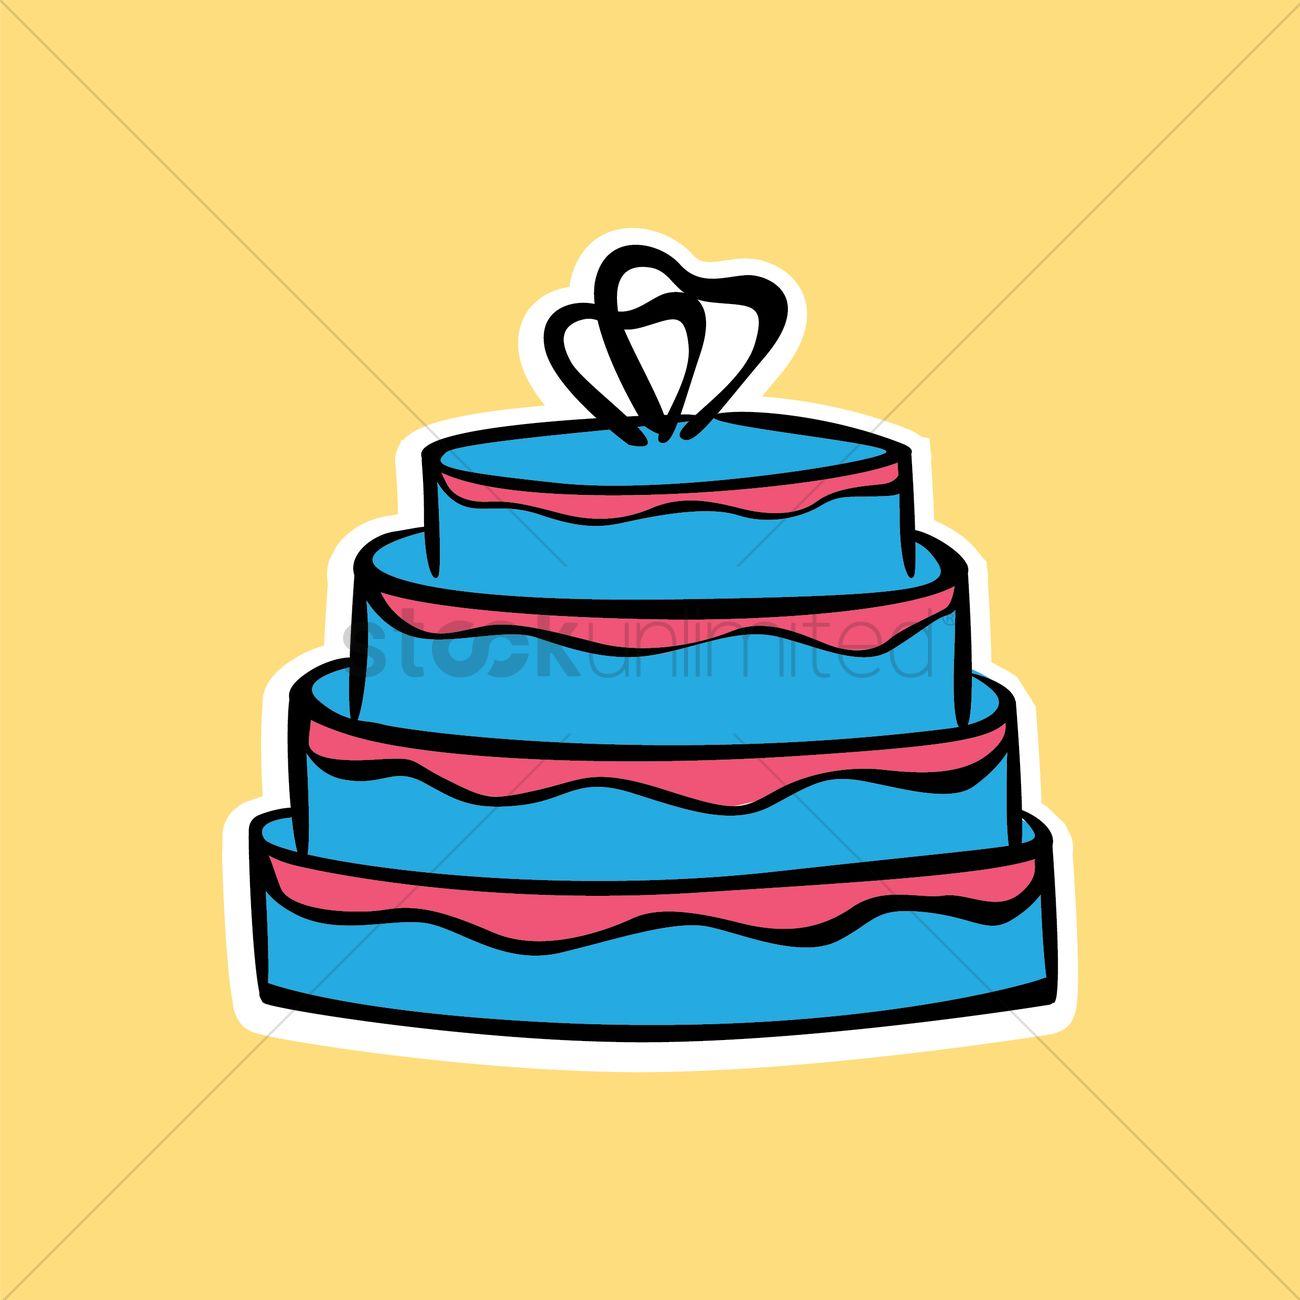 4 tier wedding cake Vector Image - 1461428 | StockUnlimited